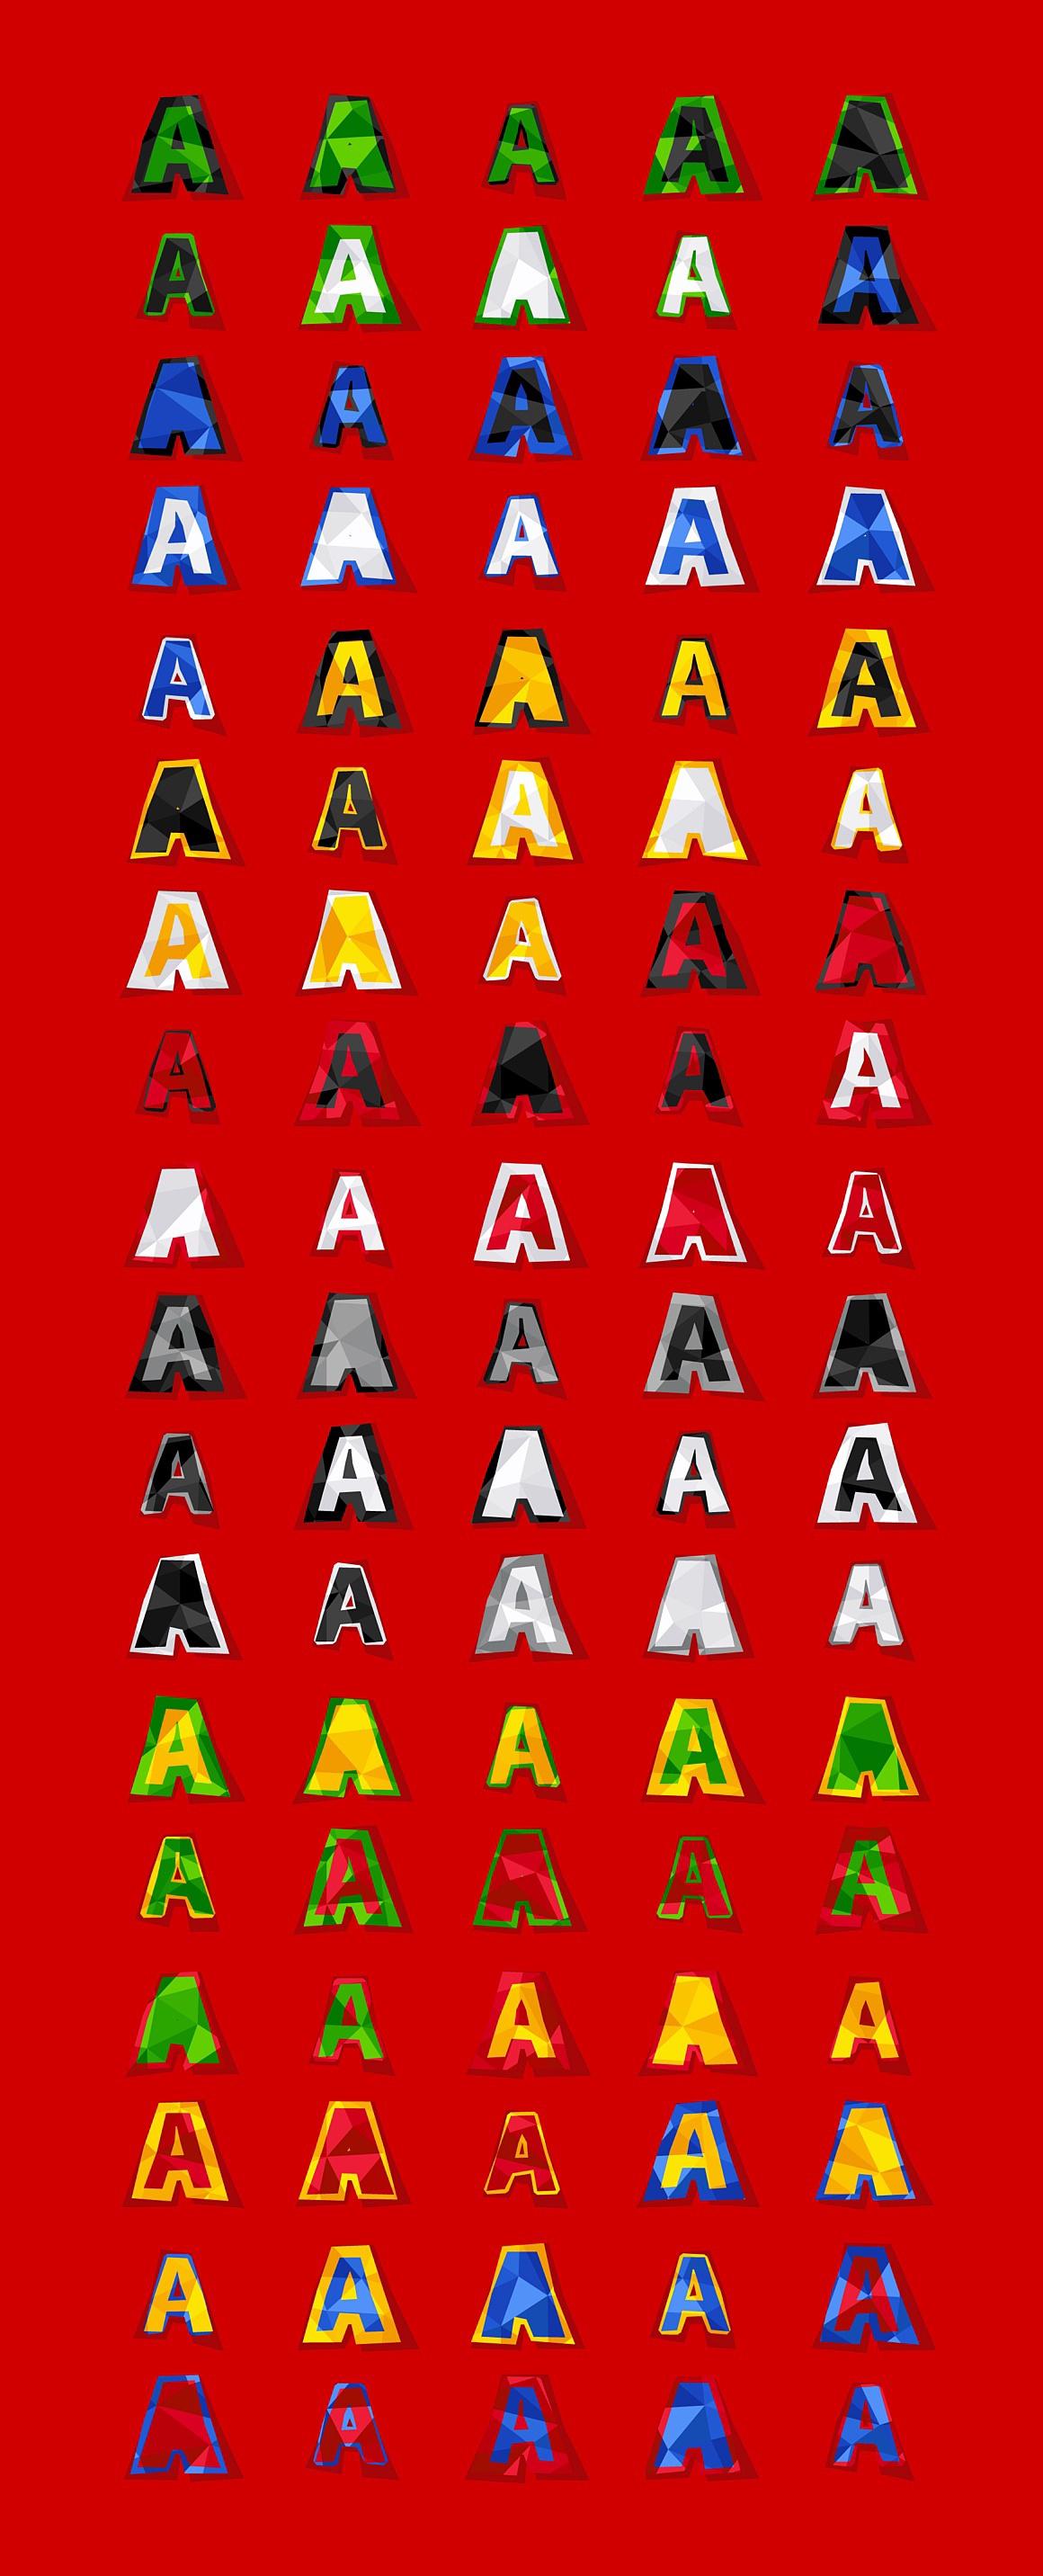 Crumpled paper style images/crumpledpaper_2_styles.jpg